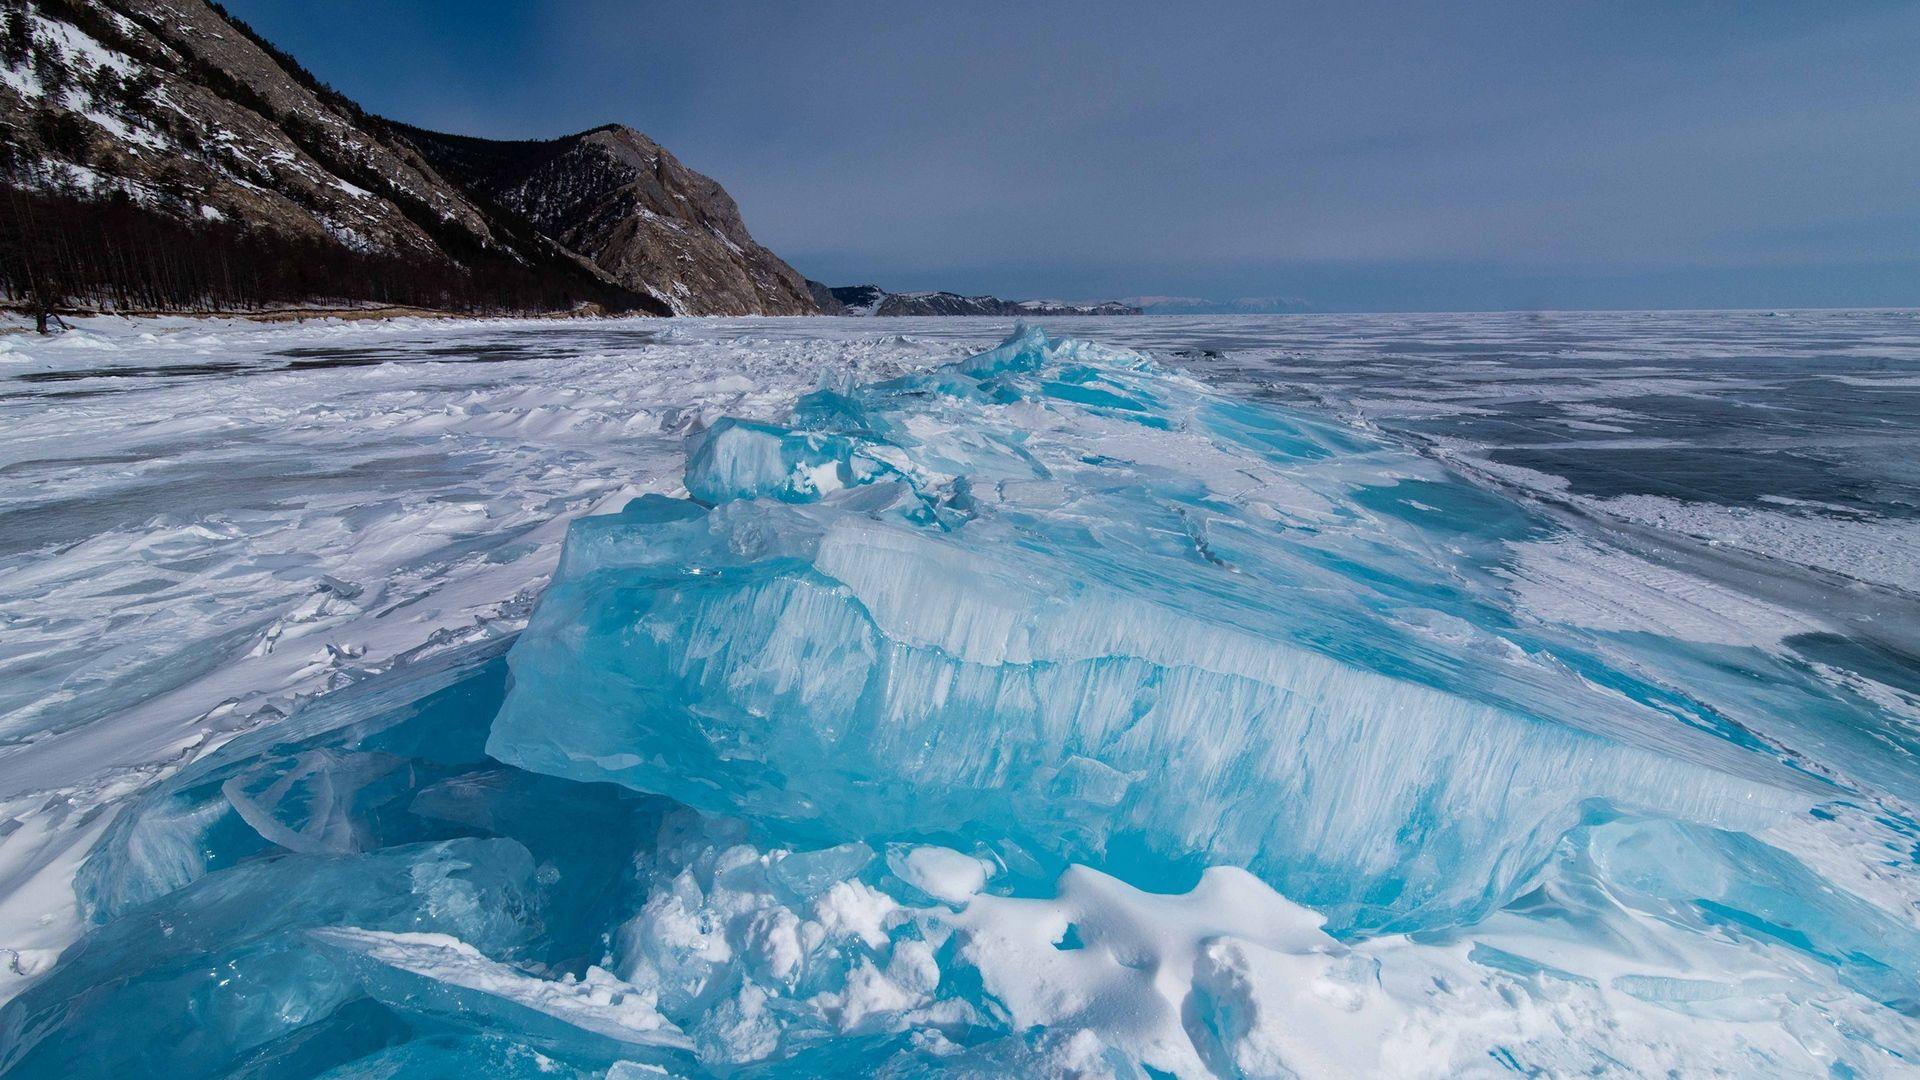 Baikal In Winter Wallpaper